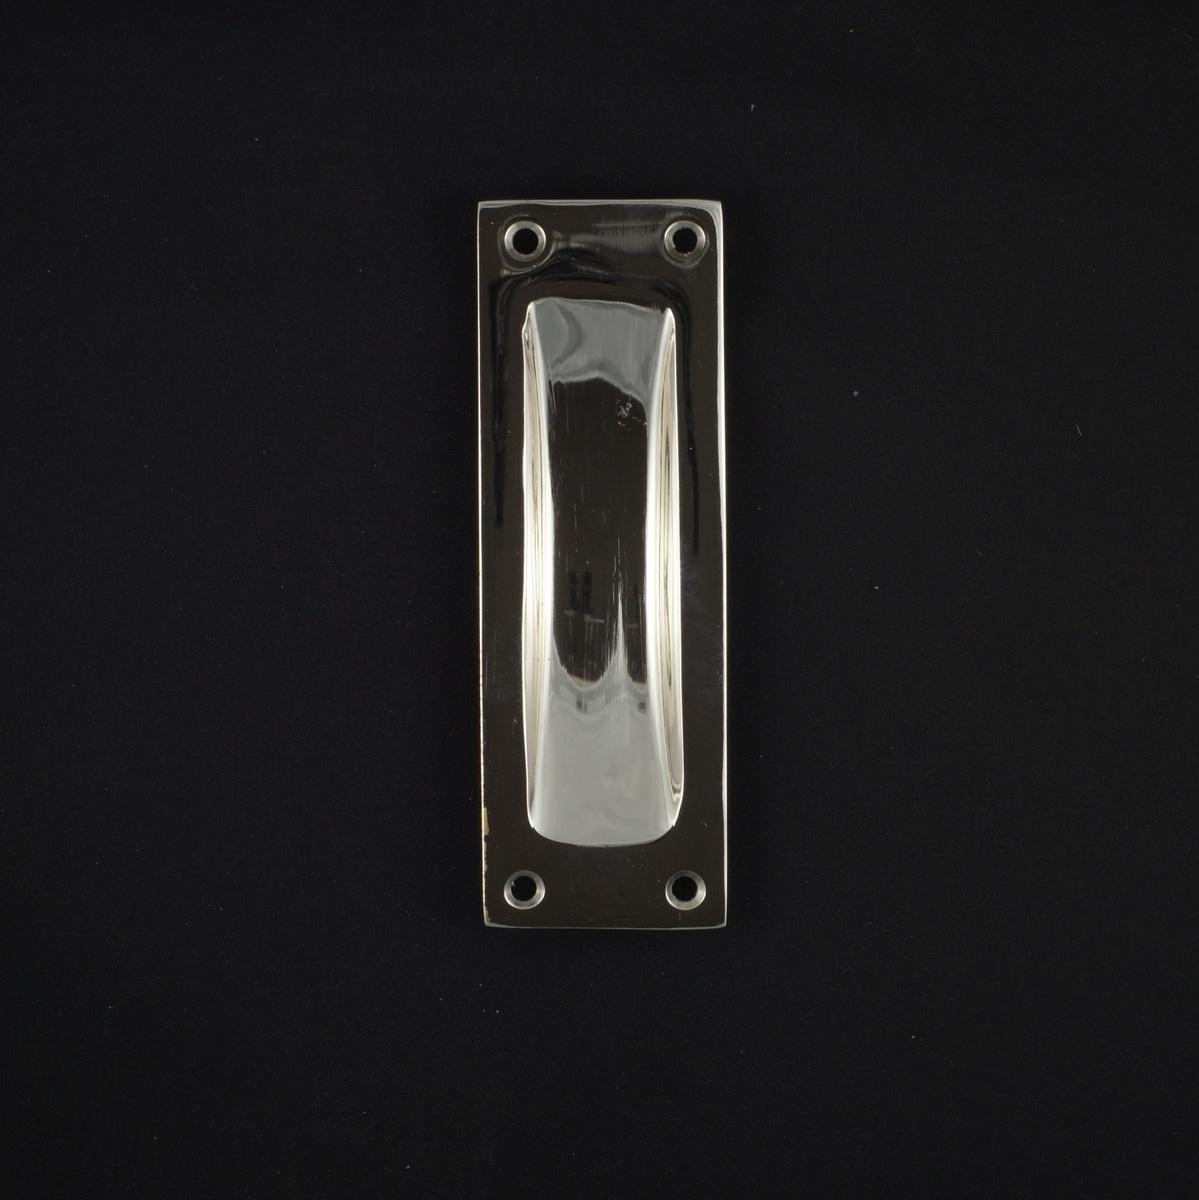 325.0010.10  Schiebetürmuschel - antike Türmuschel